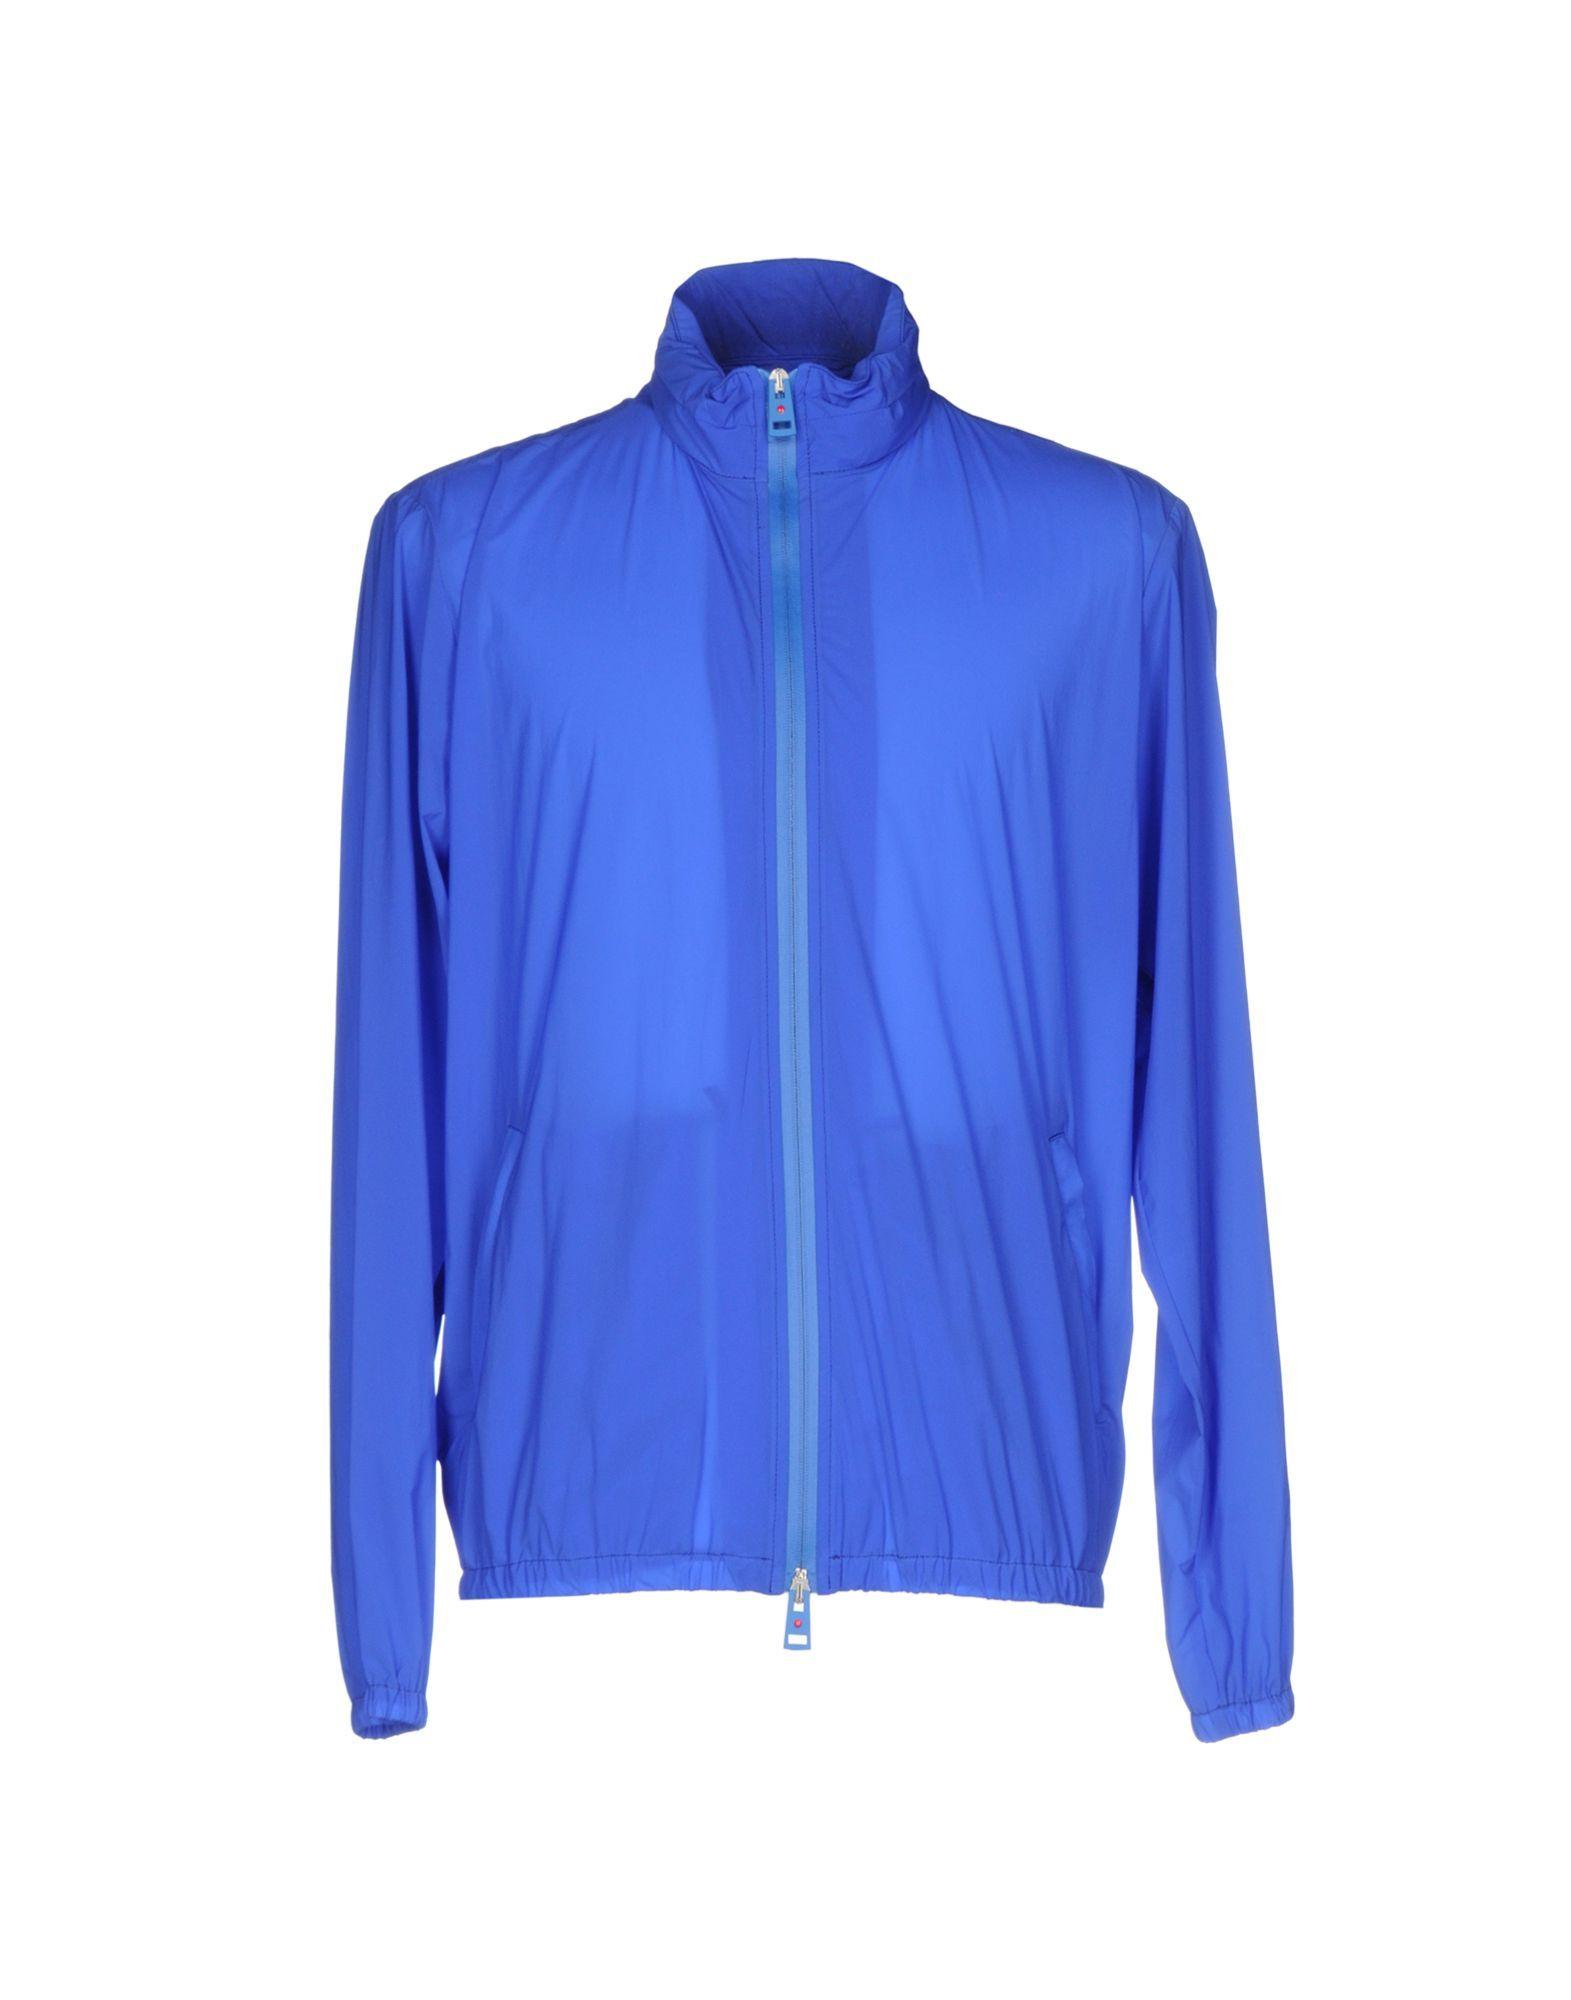 Blue single-breasted turtleneck jacket